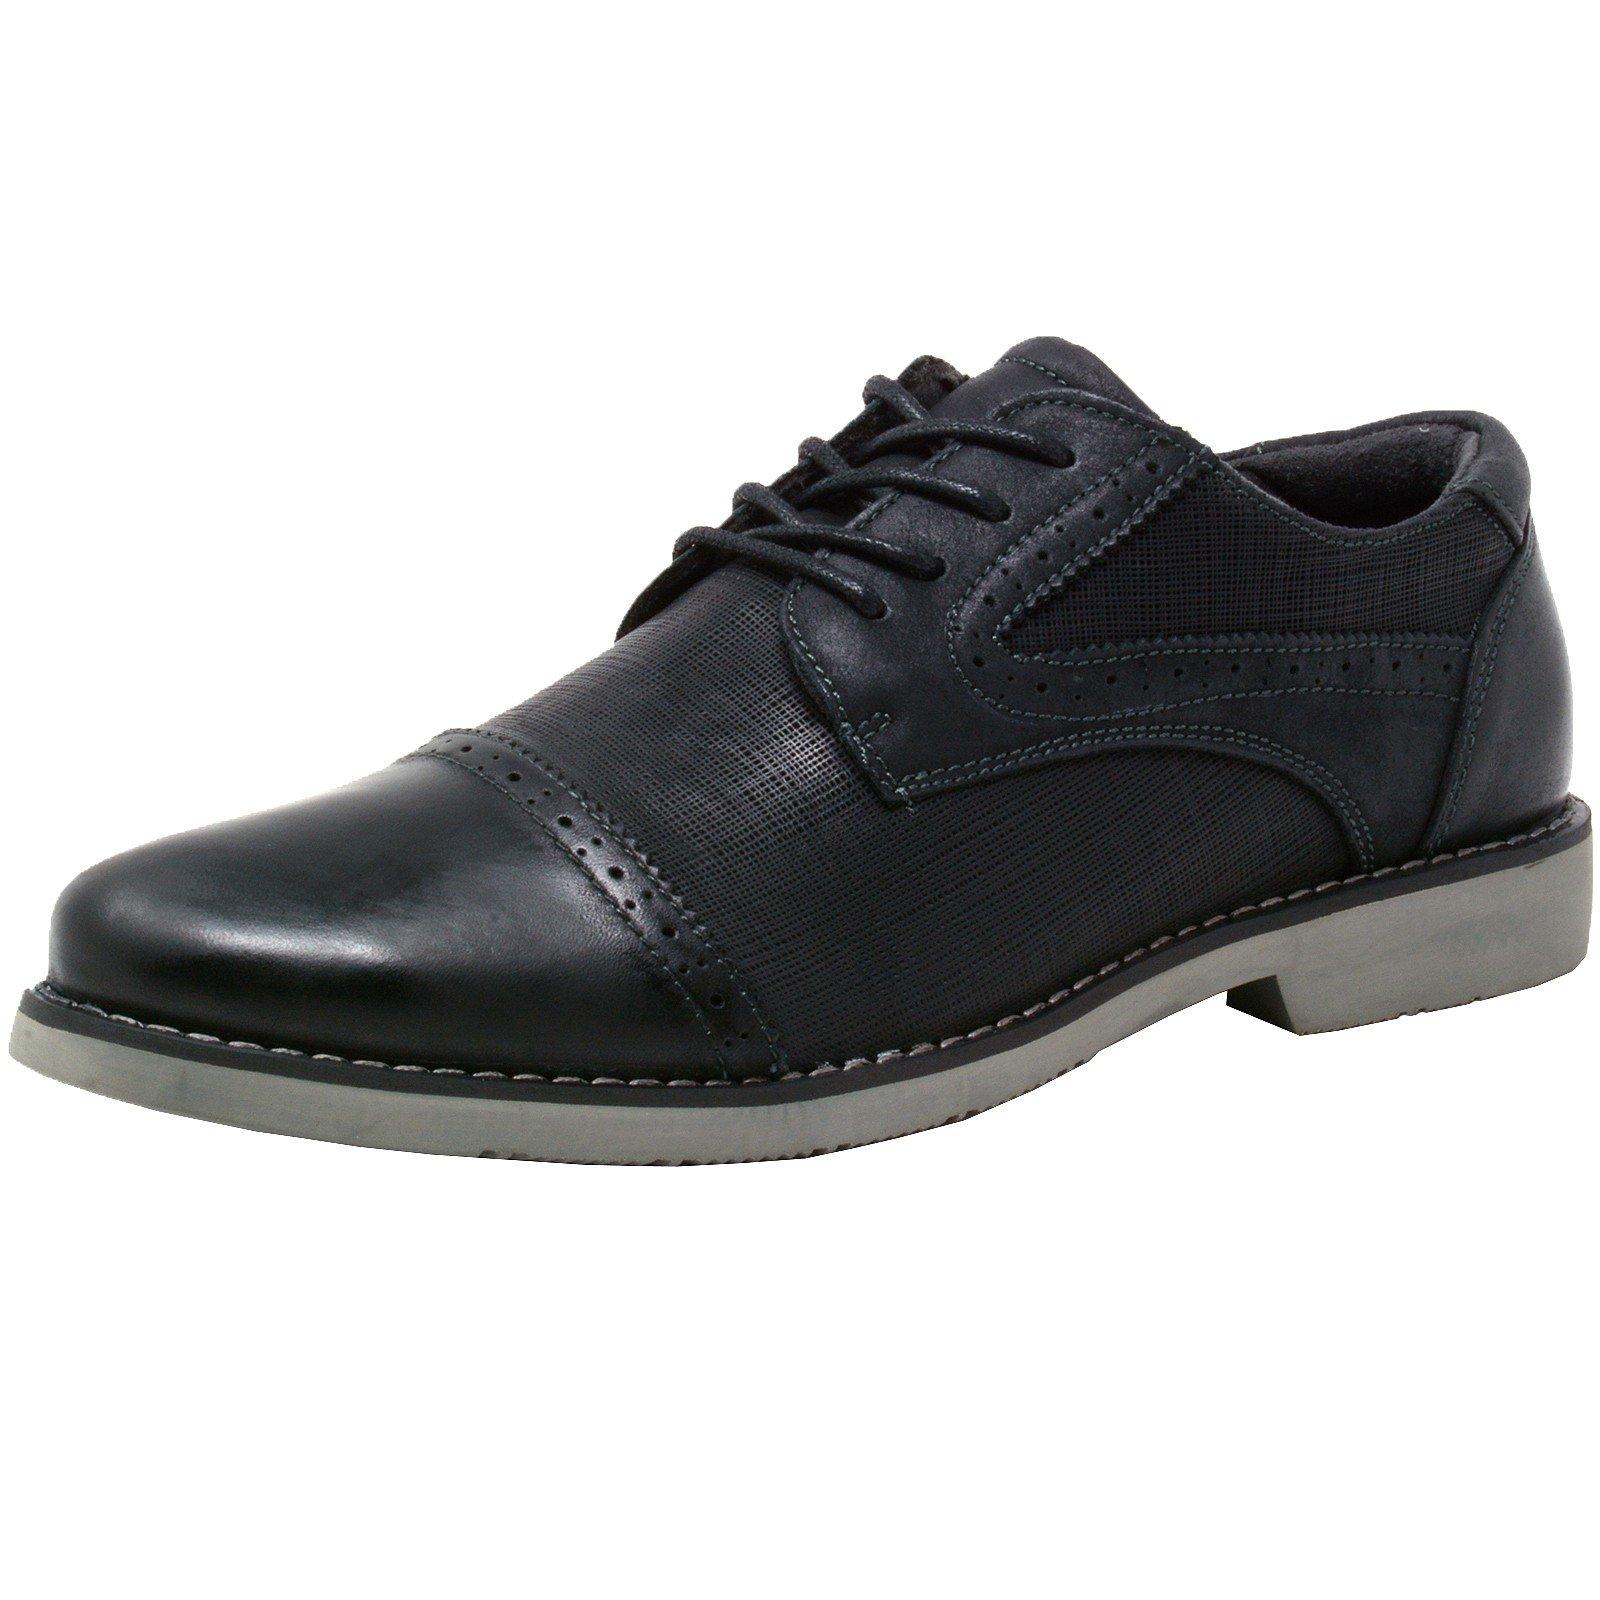 alpine swiss Double Diamond Men's Genuine Leather Cap Toe Oxford Dress Shoes BLK 8 M US